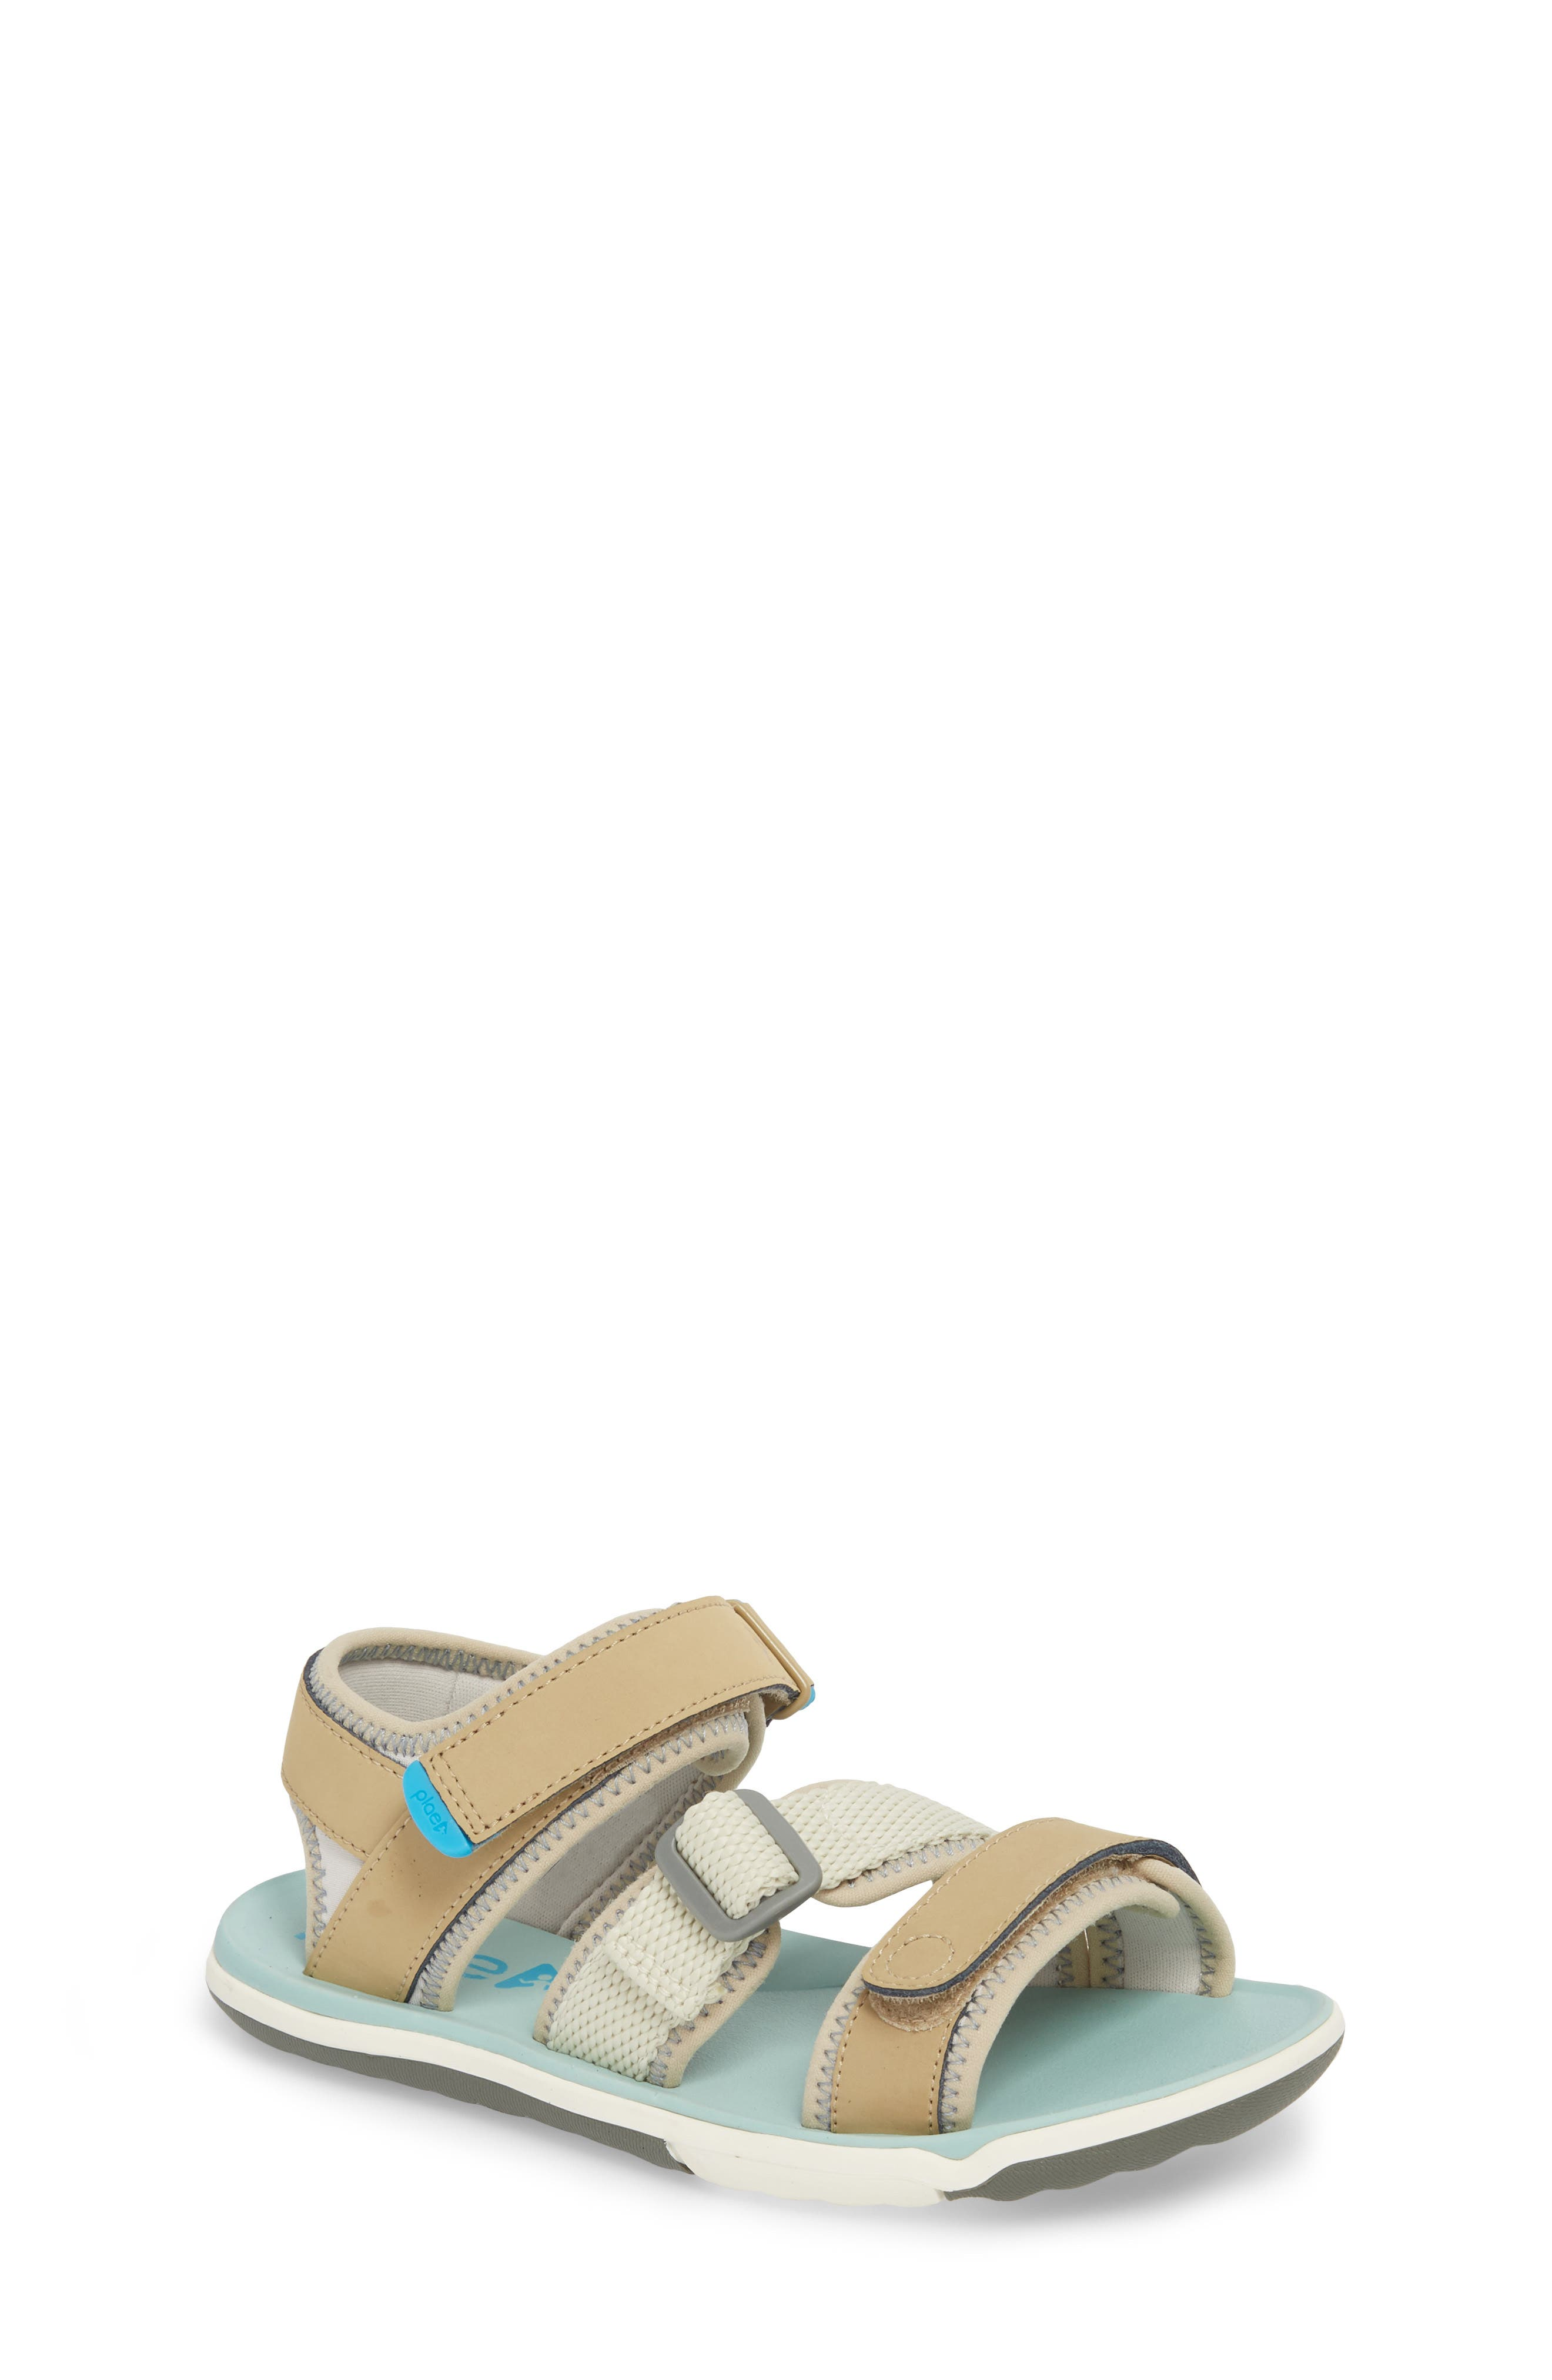 Wes Customizable Sandal,                             Main thumbnail 1, color,                             250